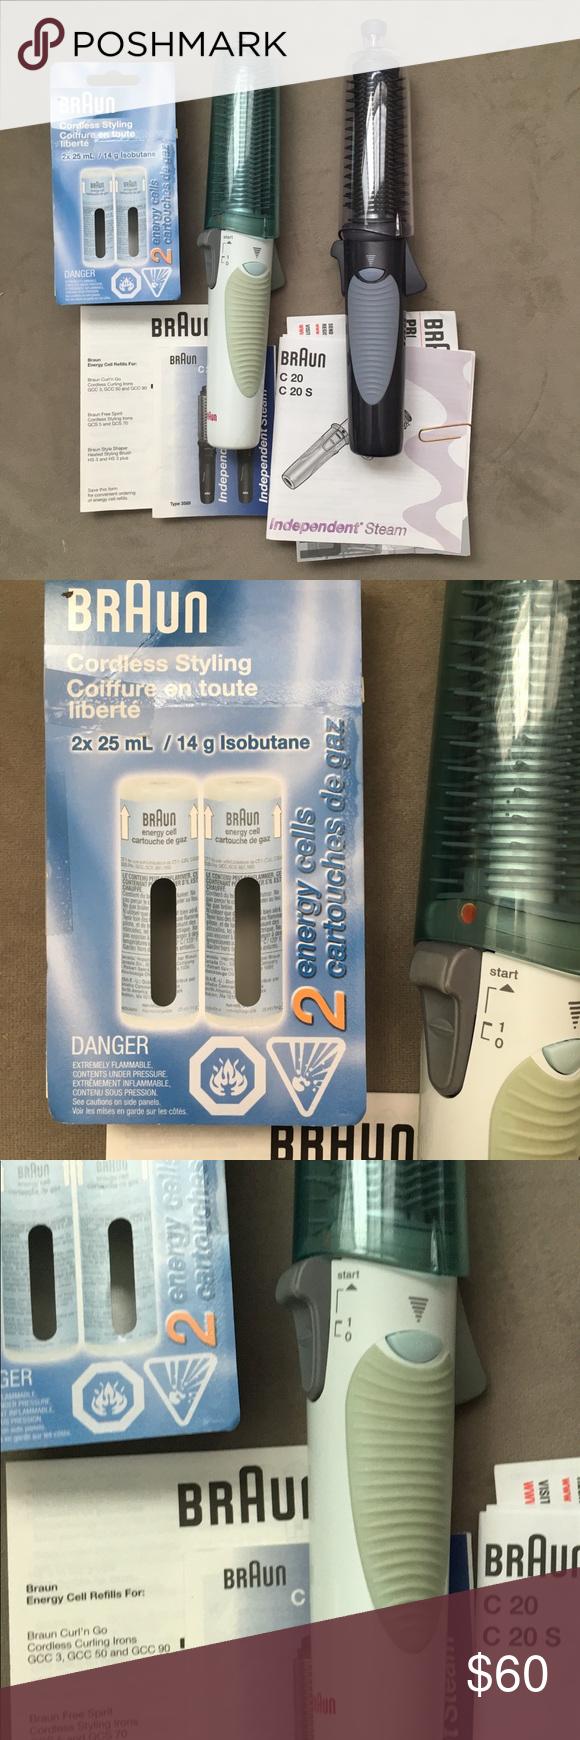 Braun Curler Straightener Dryer Curlers My New Haircut Energy C